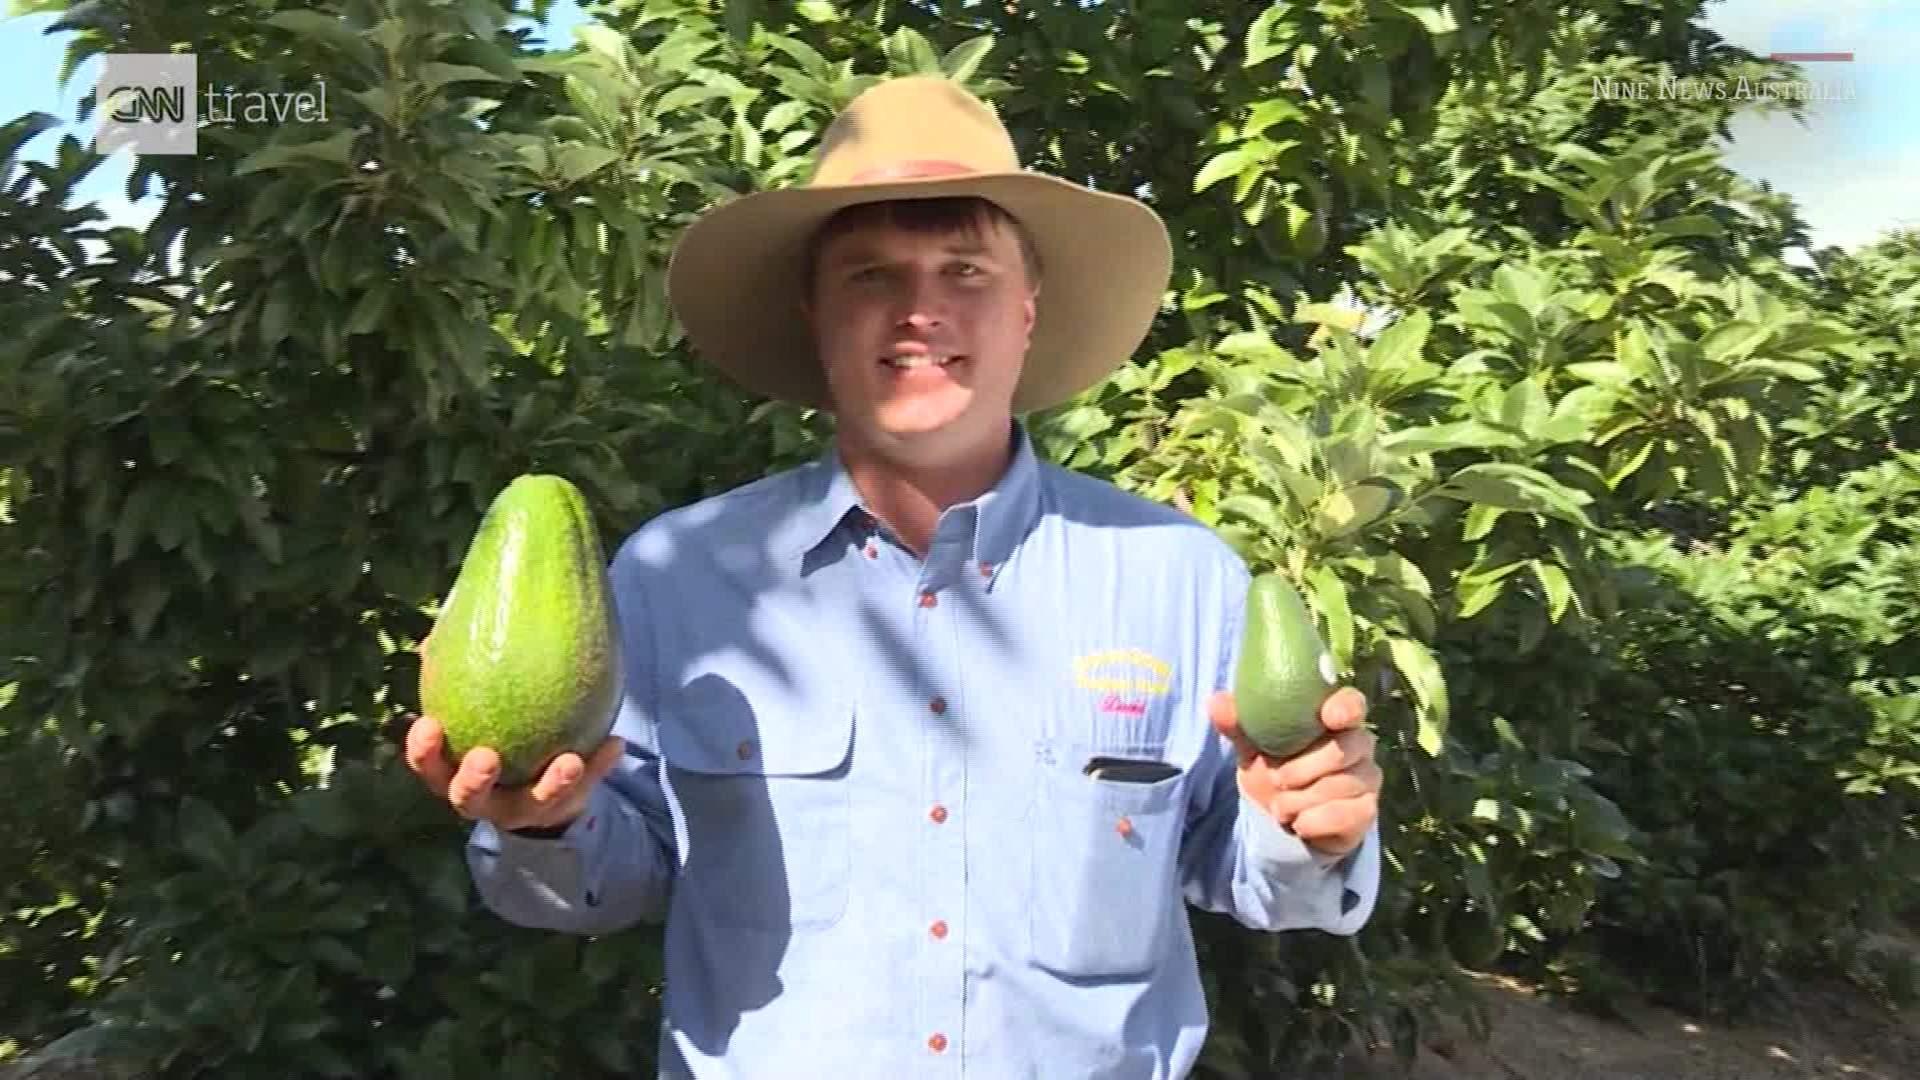 Giant avocados on sale in Australia